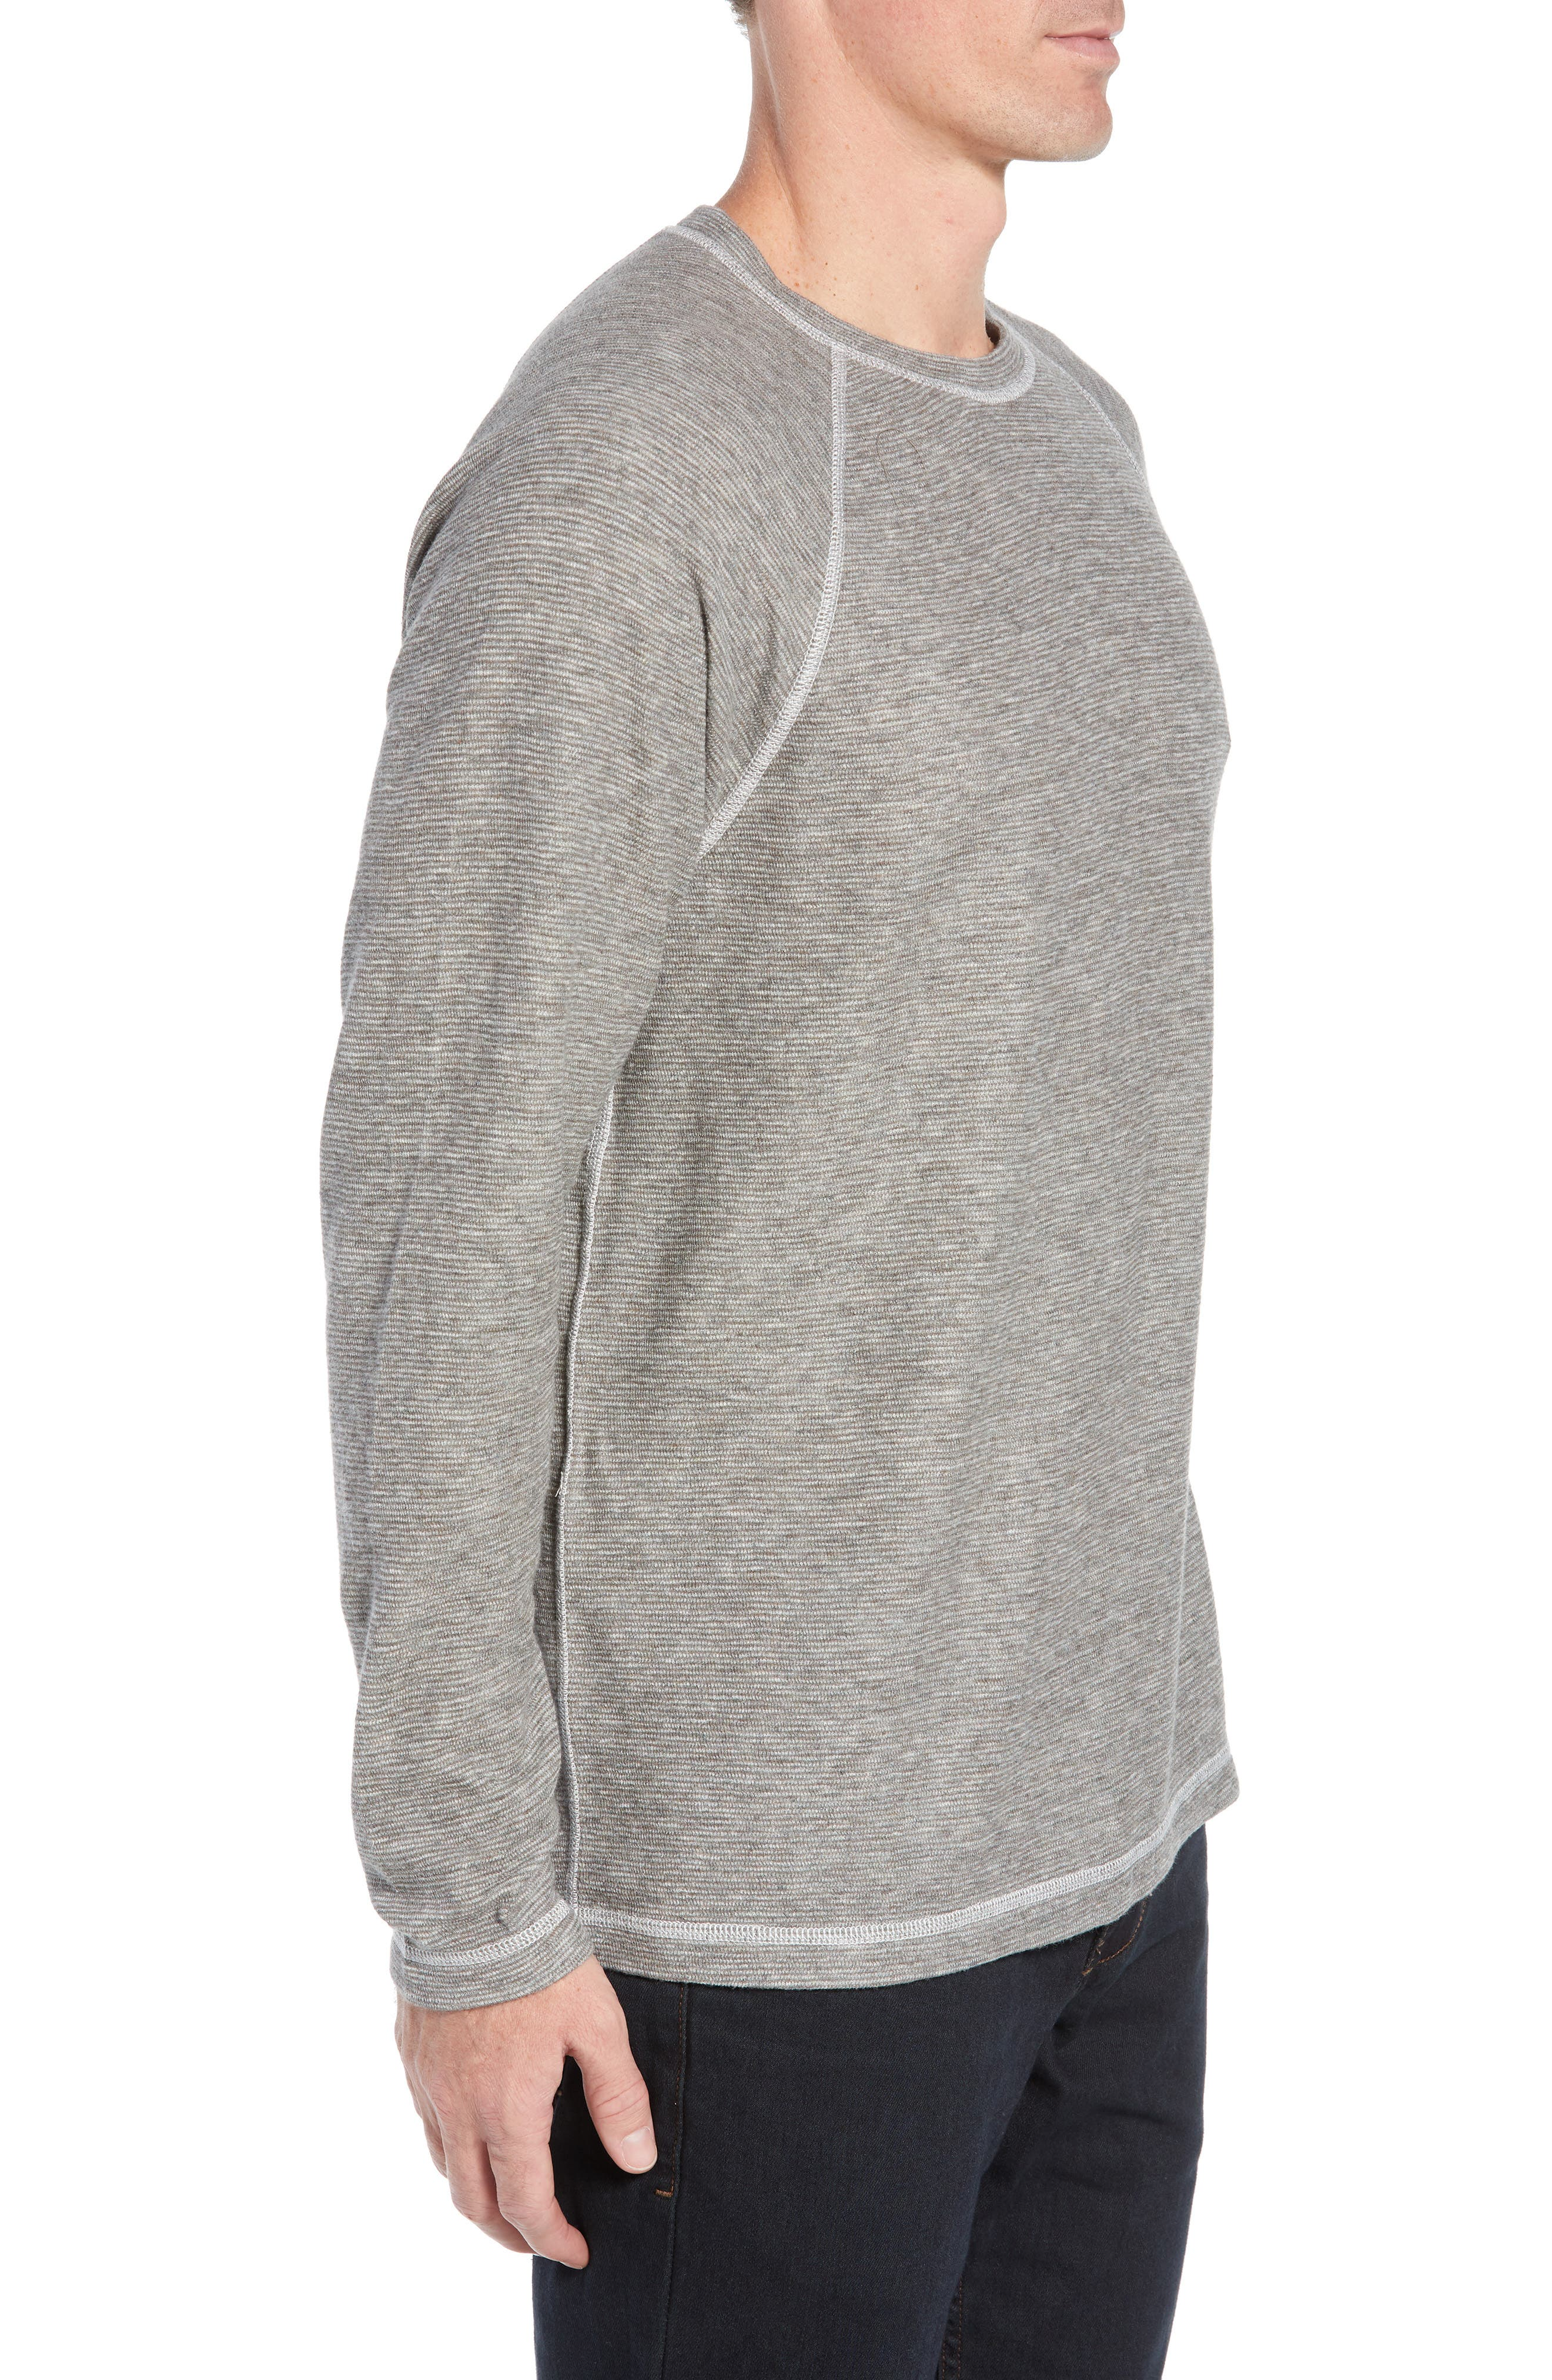 Fortuna Flip Regular Fit Shirt,                             Alternate thumbnail 4, color,                             TAUPE HEATHER